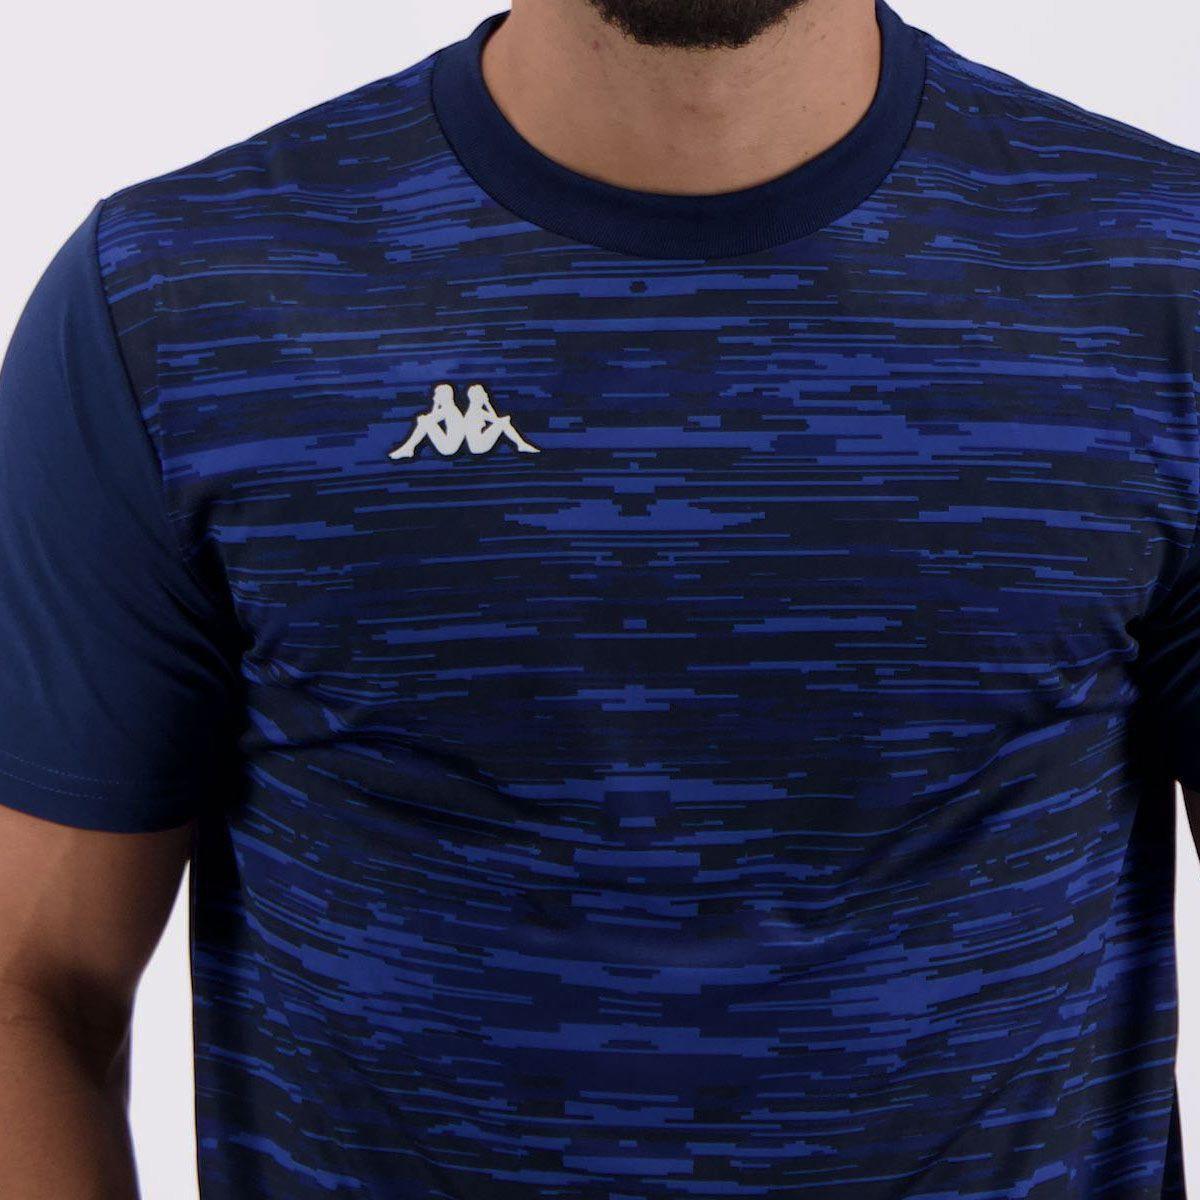 Camiseta Kappa Jenner Masculina - Marinho - Compre Agora  00ecf7df270d6